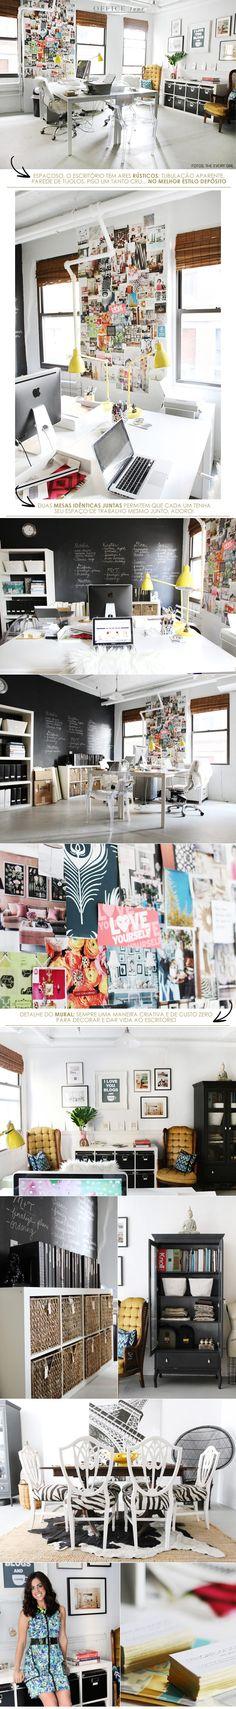 living-gazette-barbara-resende-office-tour-erin-gates-elements-of-style